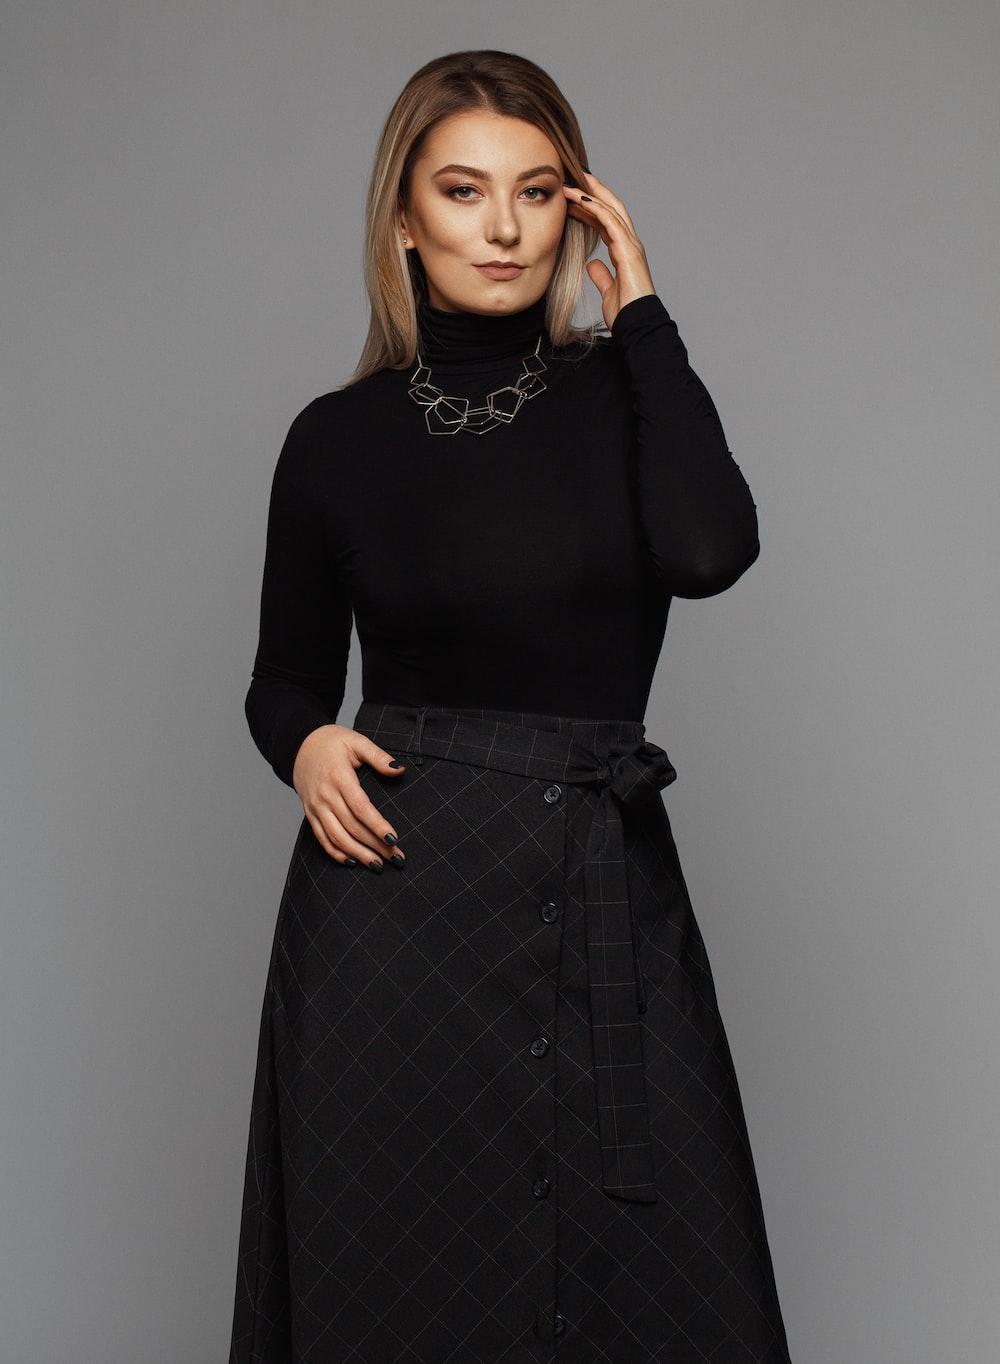 woman wearing black turtleneck long-sleeved dress